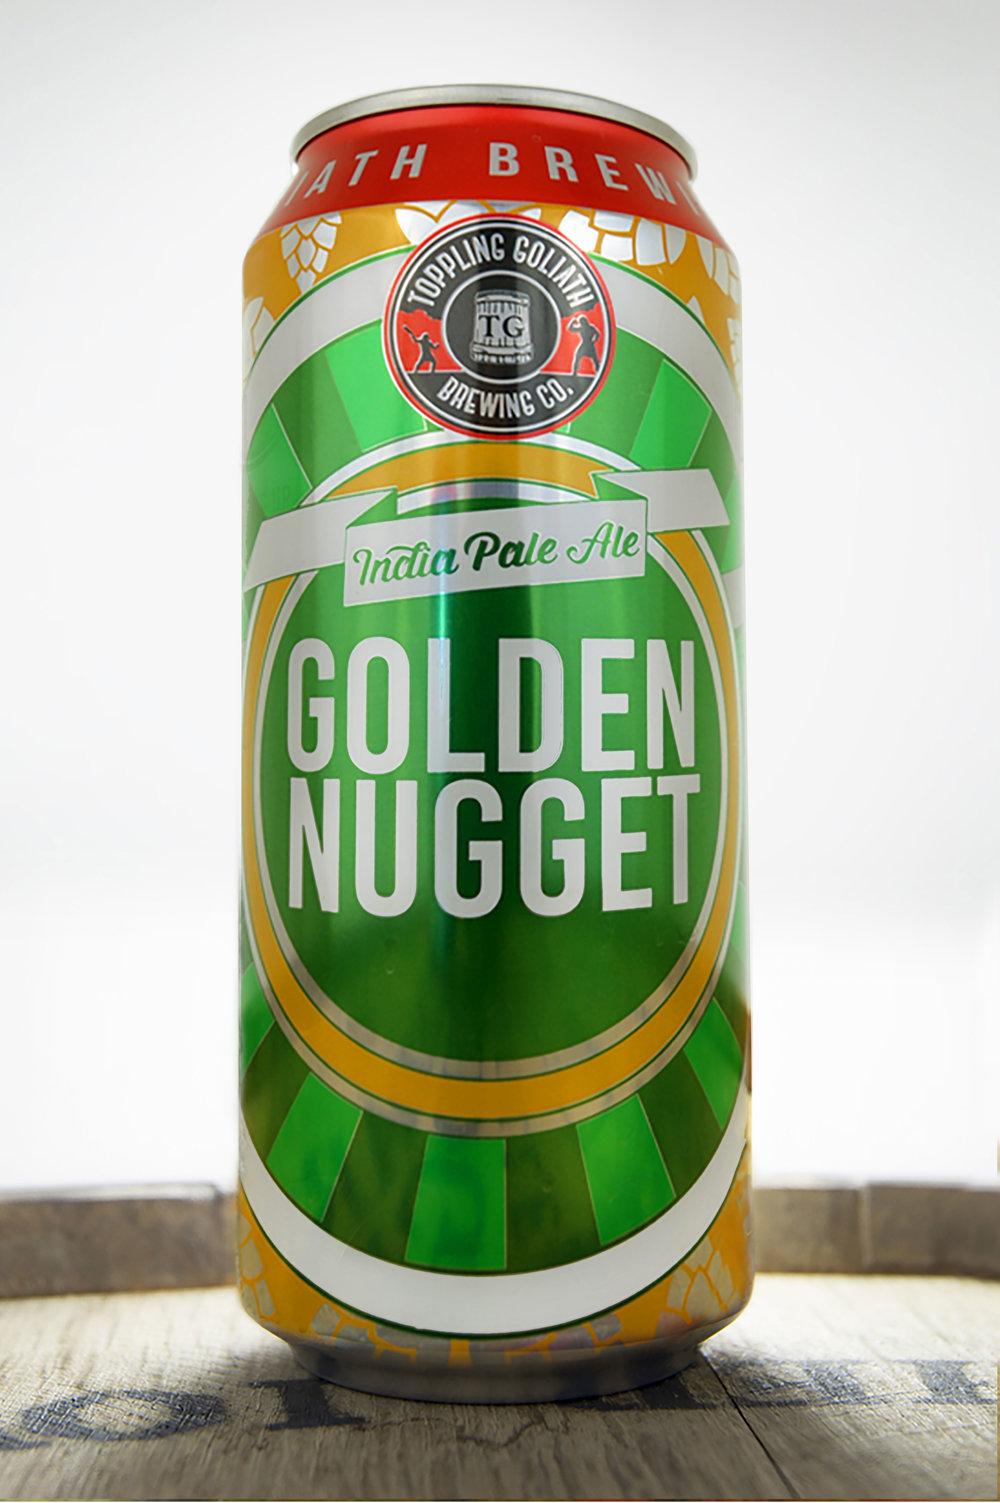 Toppling Goliath Golden Nugget IPA.jpg